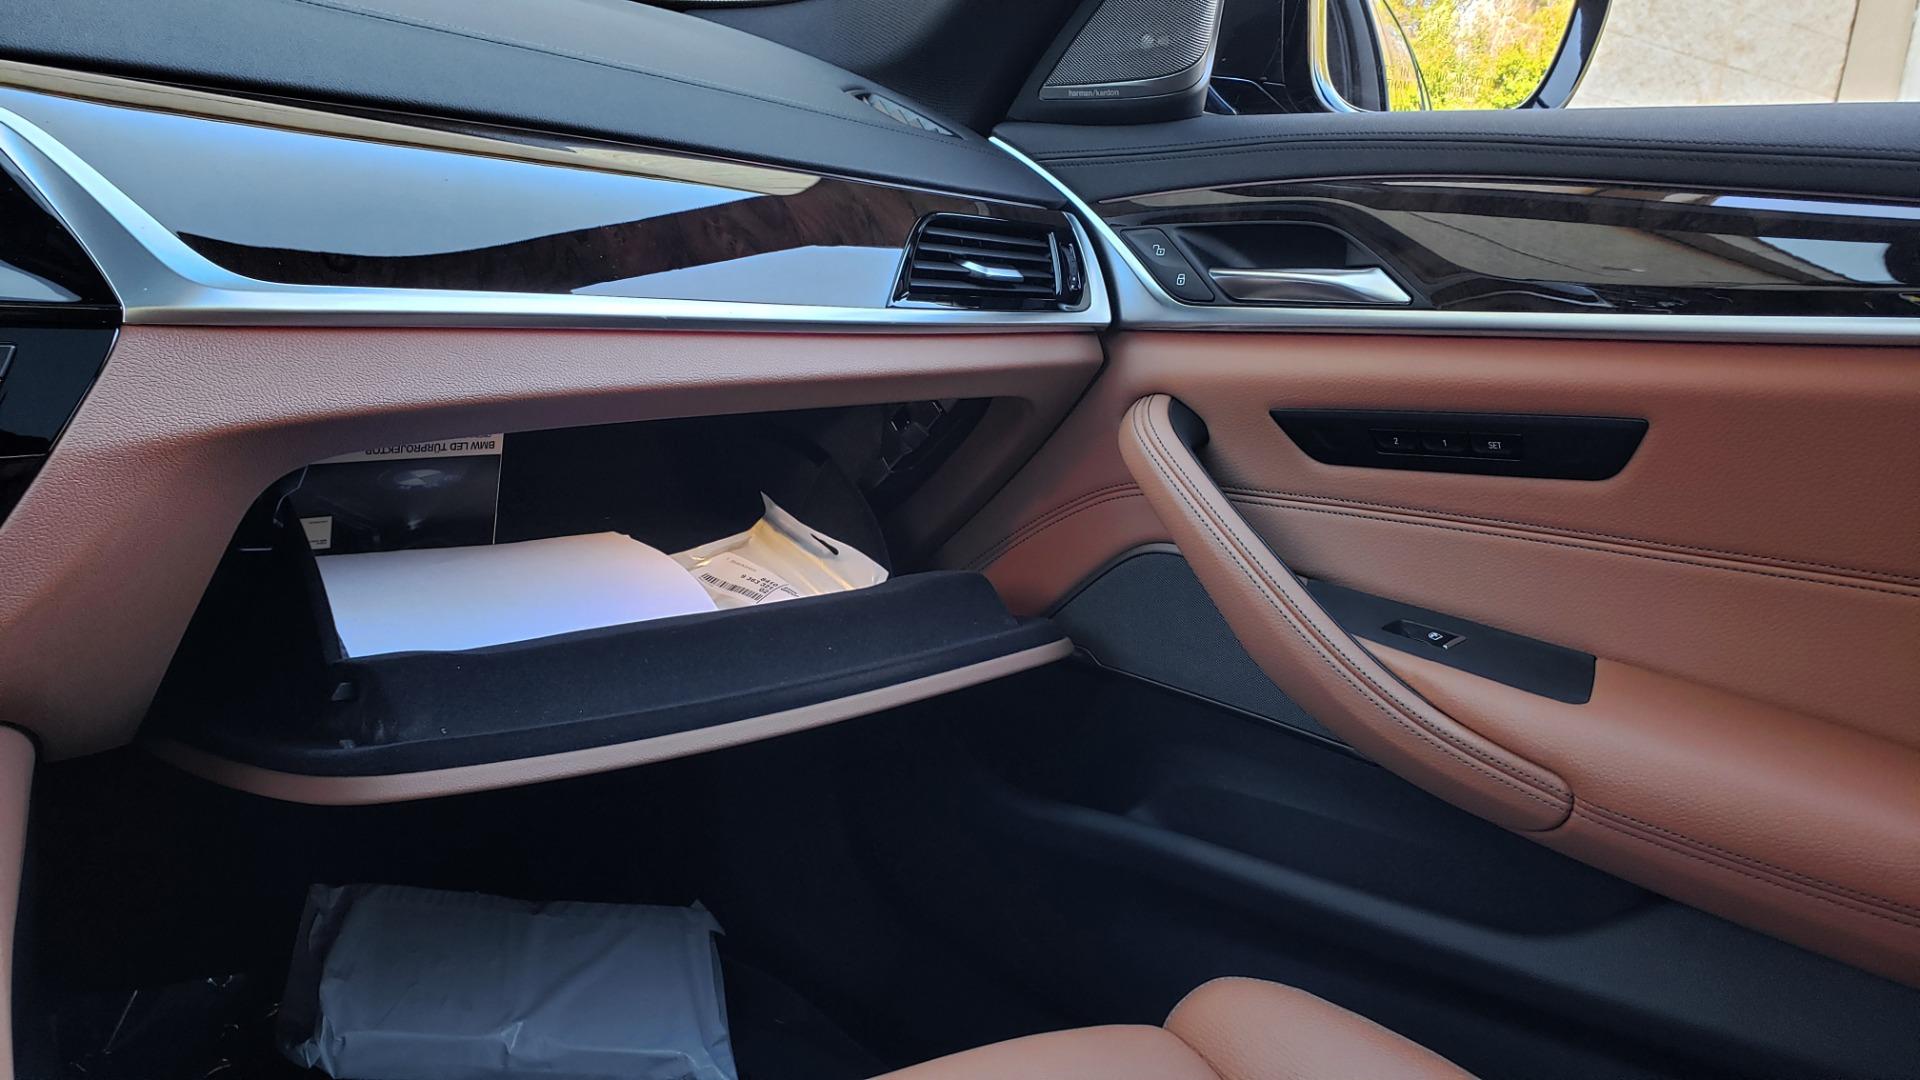 Used 2018 BMW 5 SERIES 540I M-SPORT / DRVR ASST / EXEC PKG / NAV / SUNROOF / HUD / REARVIEW for sale Sold at Formula Imports in Charlotte NC 28227 54